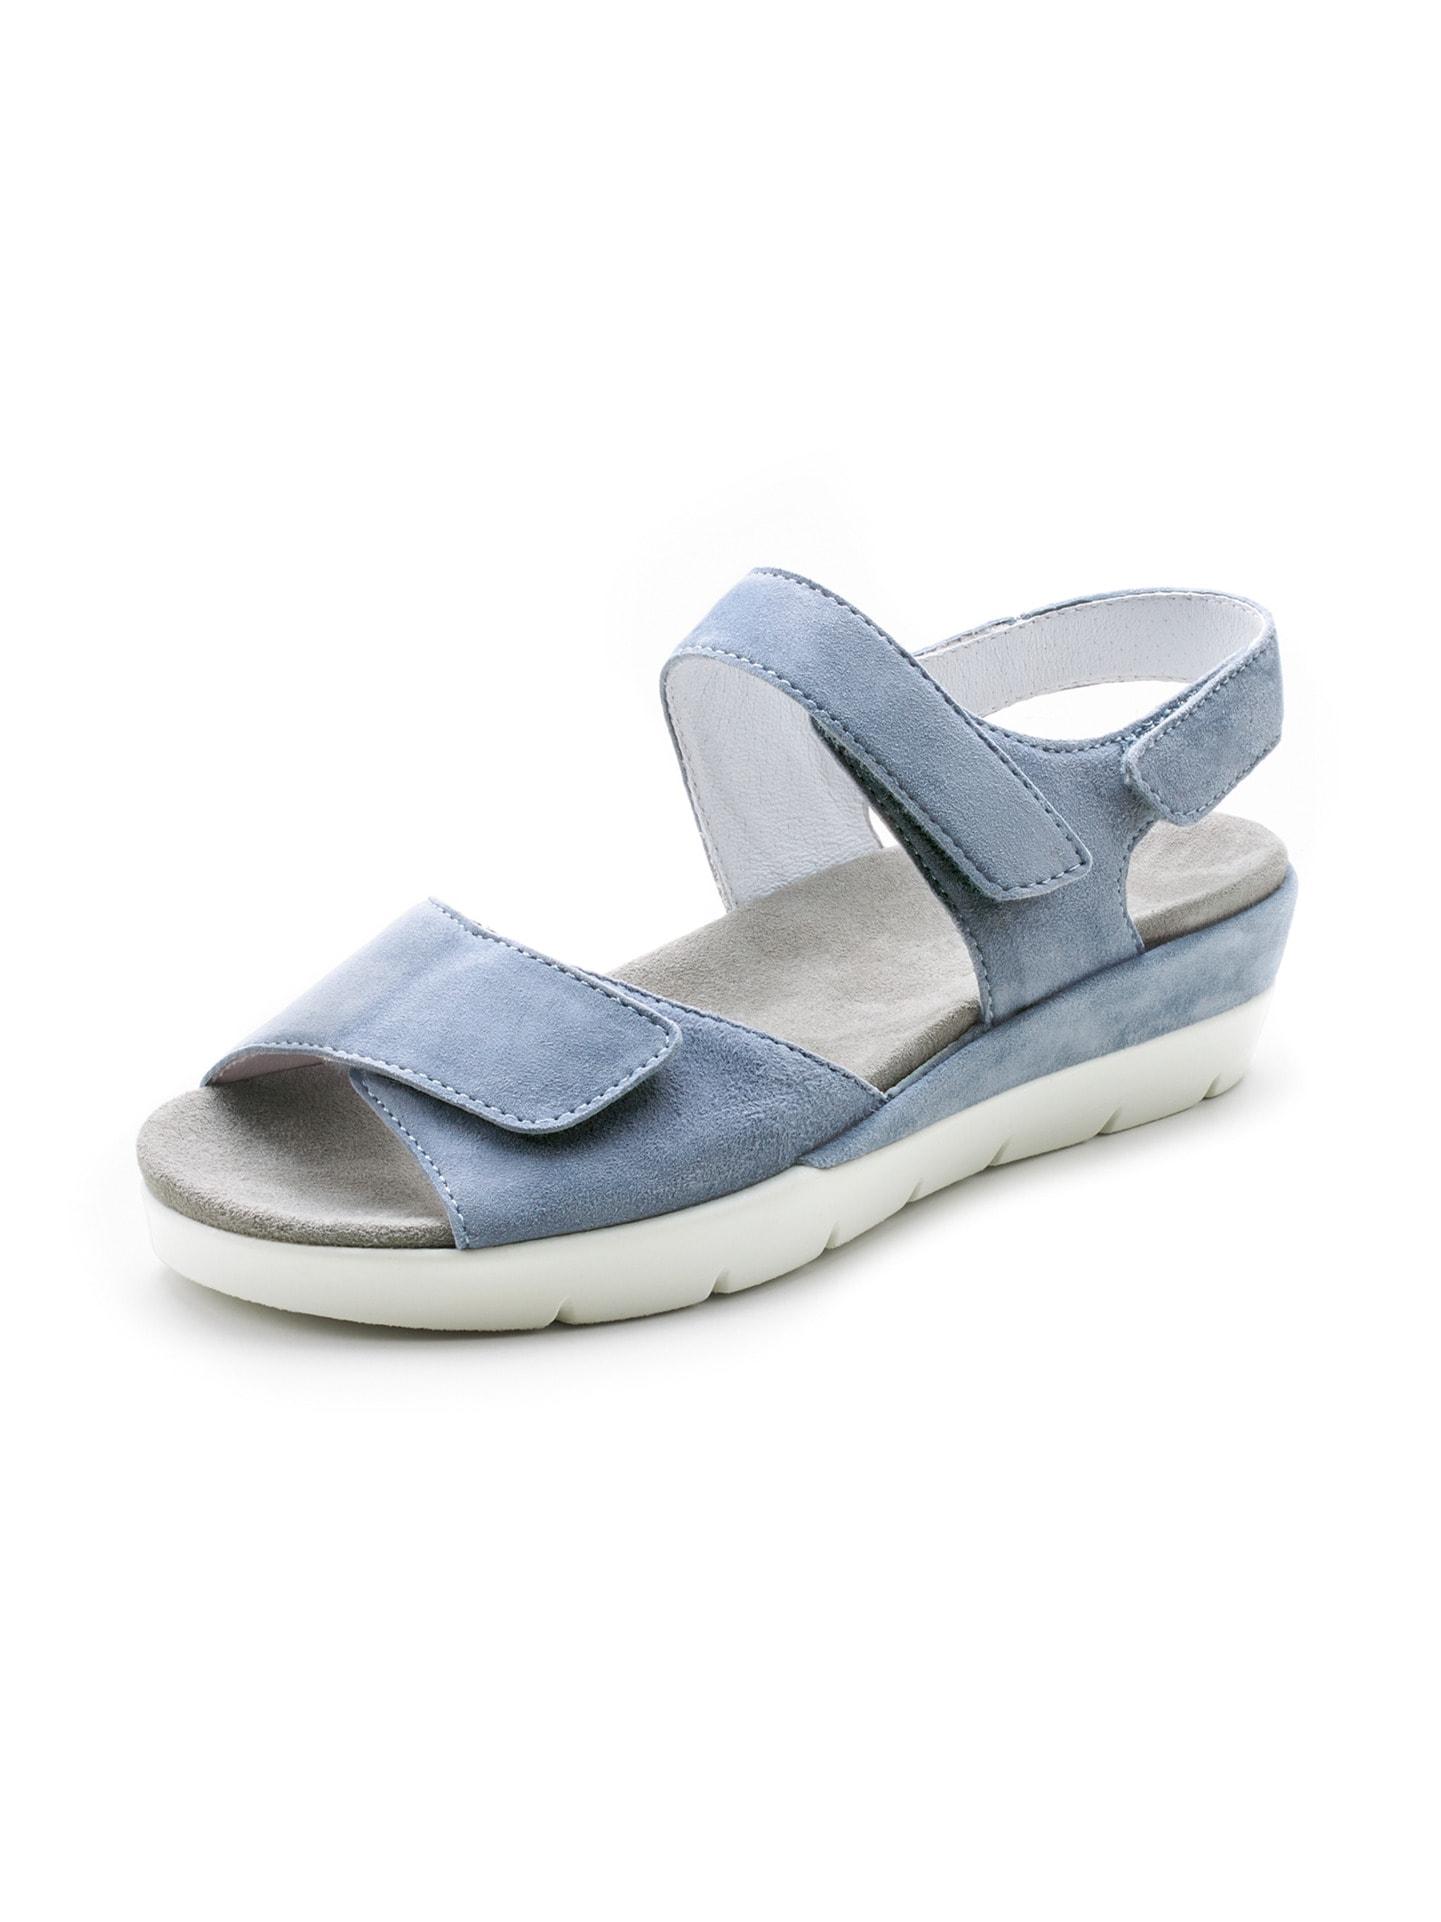 Avena Damen Hallux-Sandale Wolke 7 Blau 45-7462-2